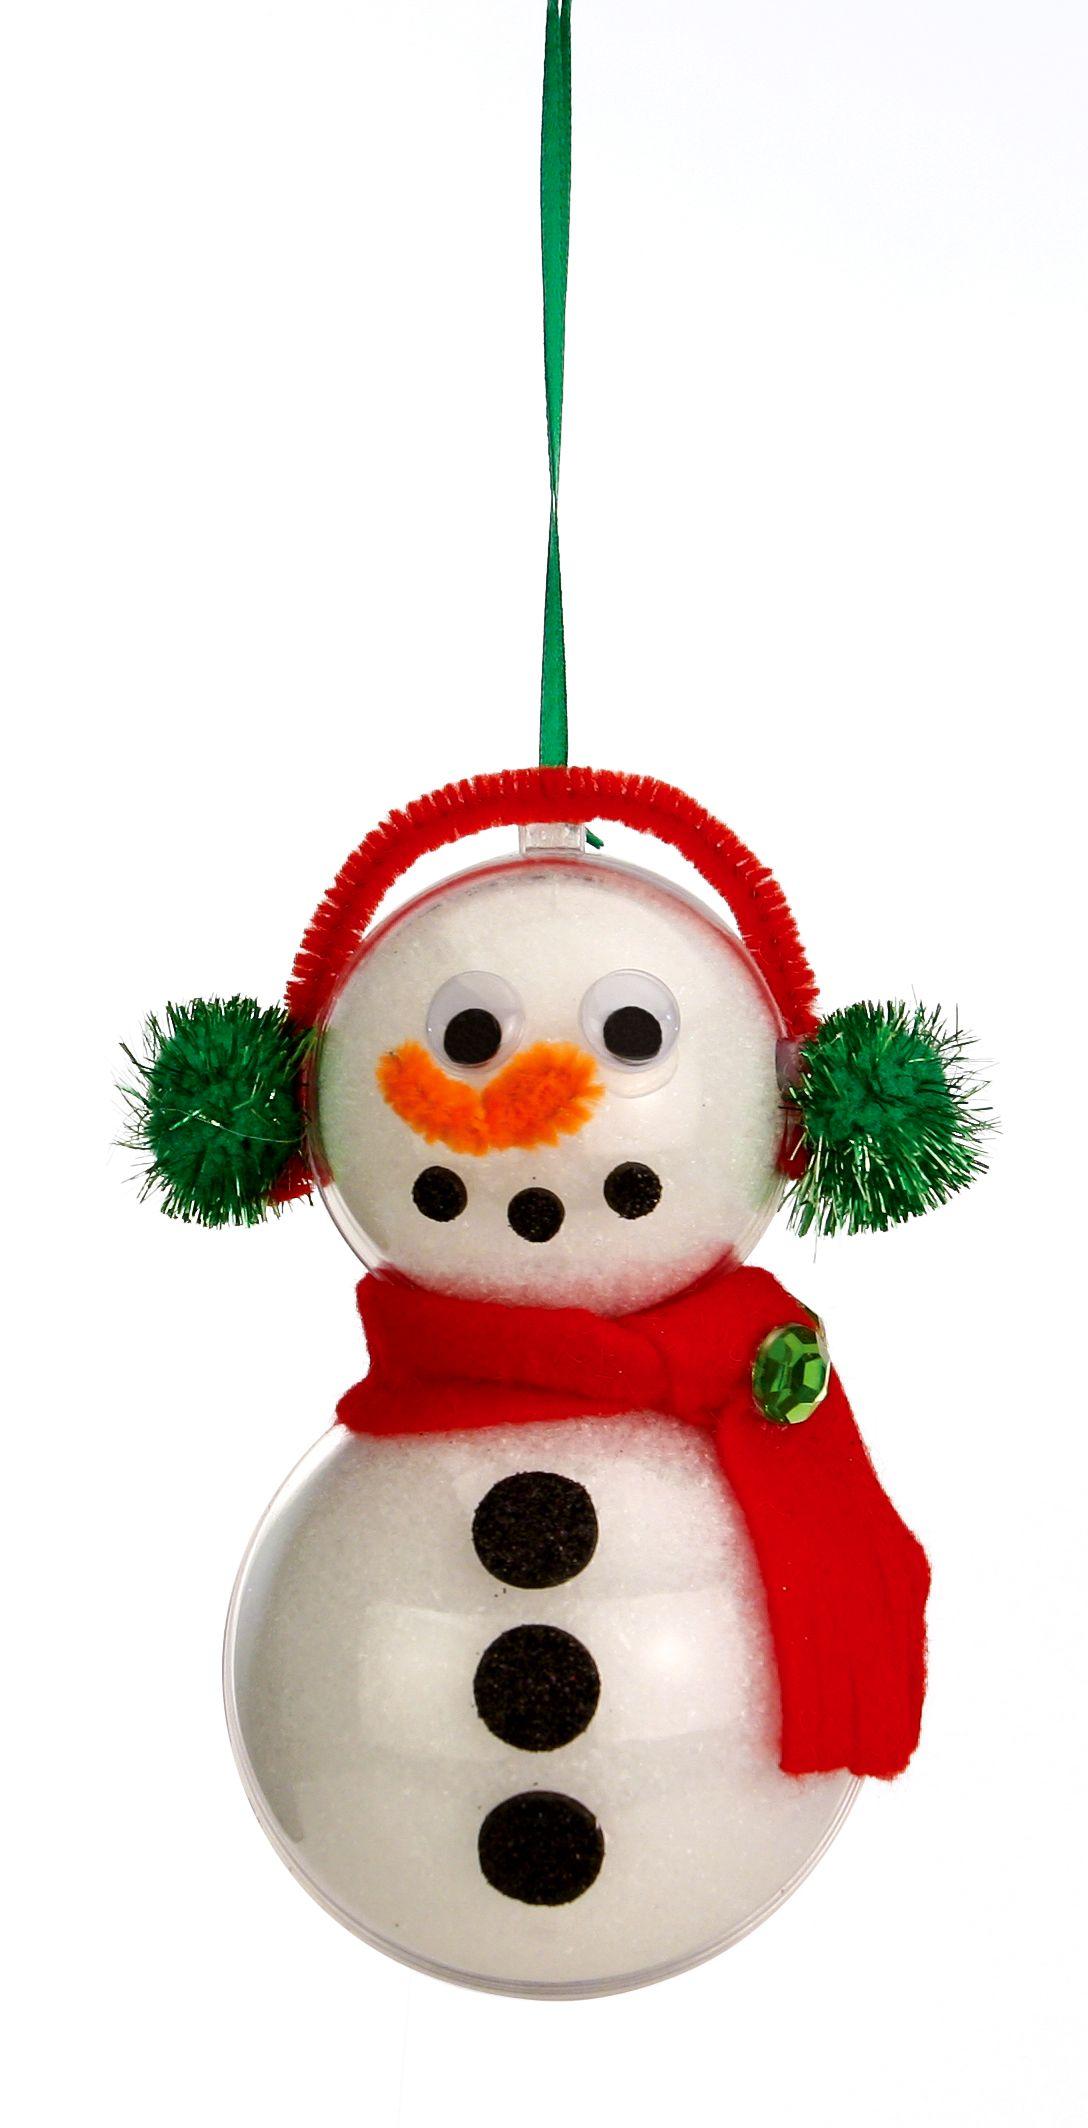 Nicole Crafts Double Bubble Snowman Ornament Ornaments